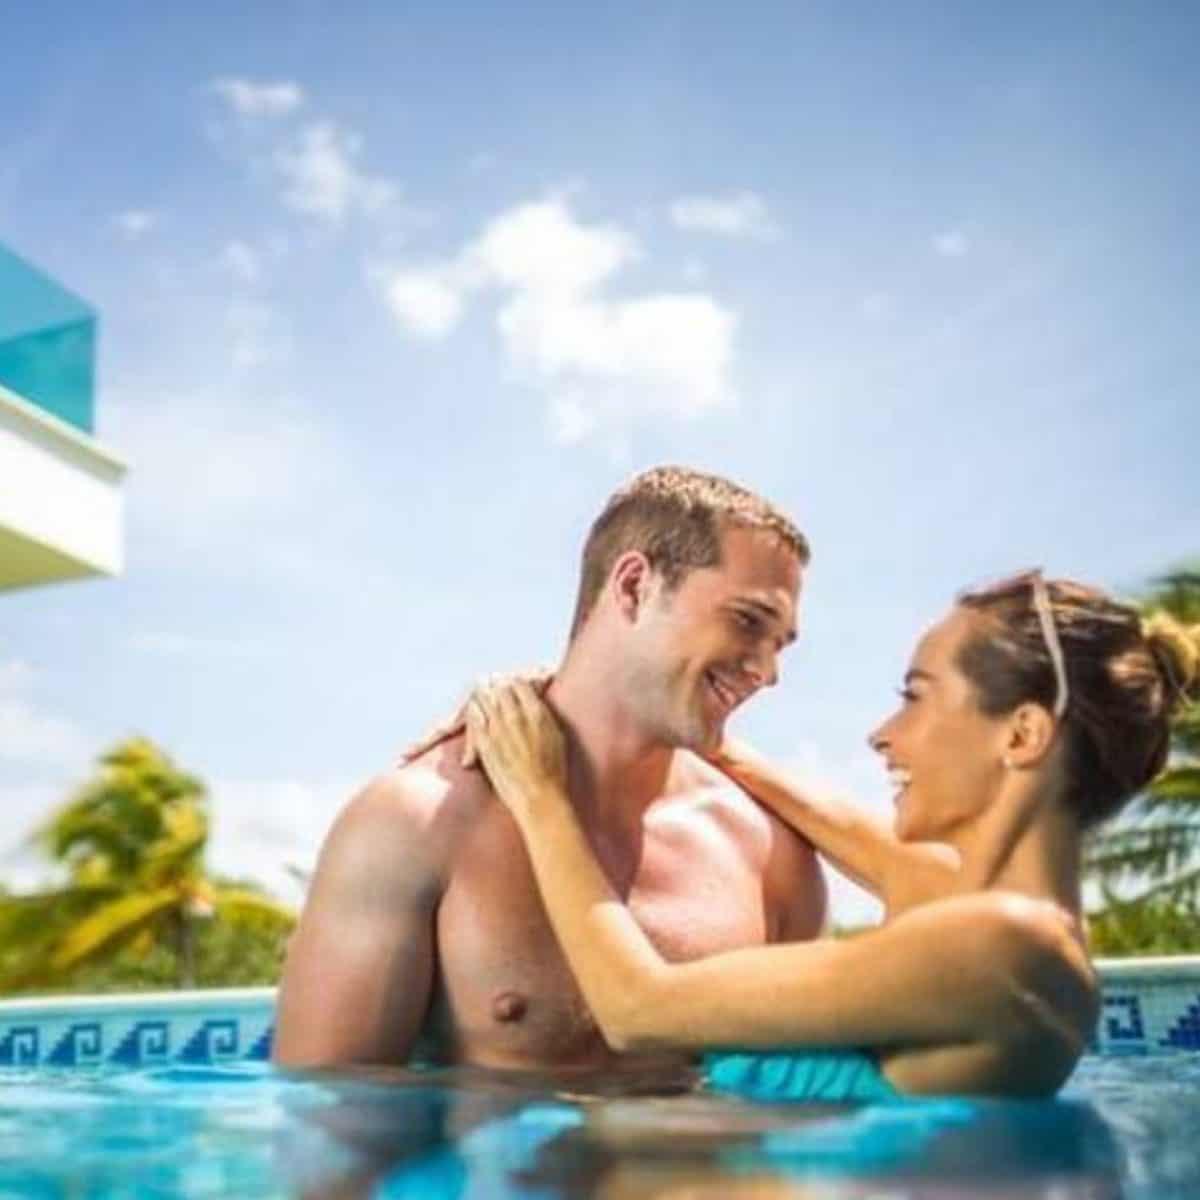 Pareja En Cancun Planesturisticos.com - Cancún 2X: 4 Días Todo Incluido | Con Vuelos Bogotá | 2021